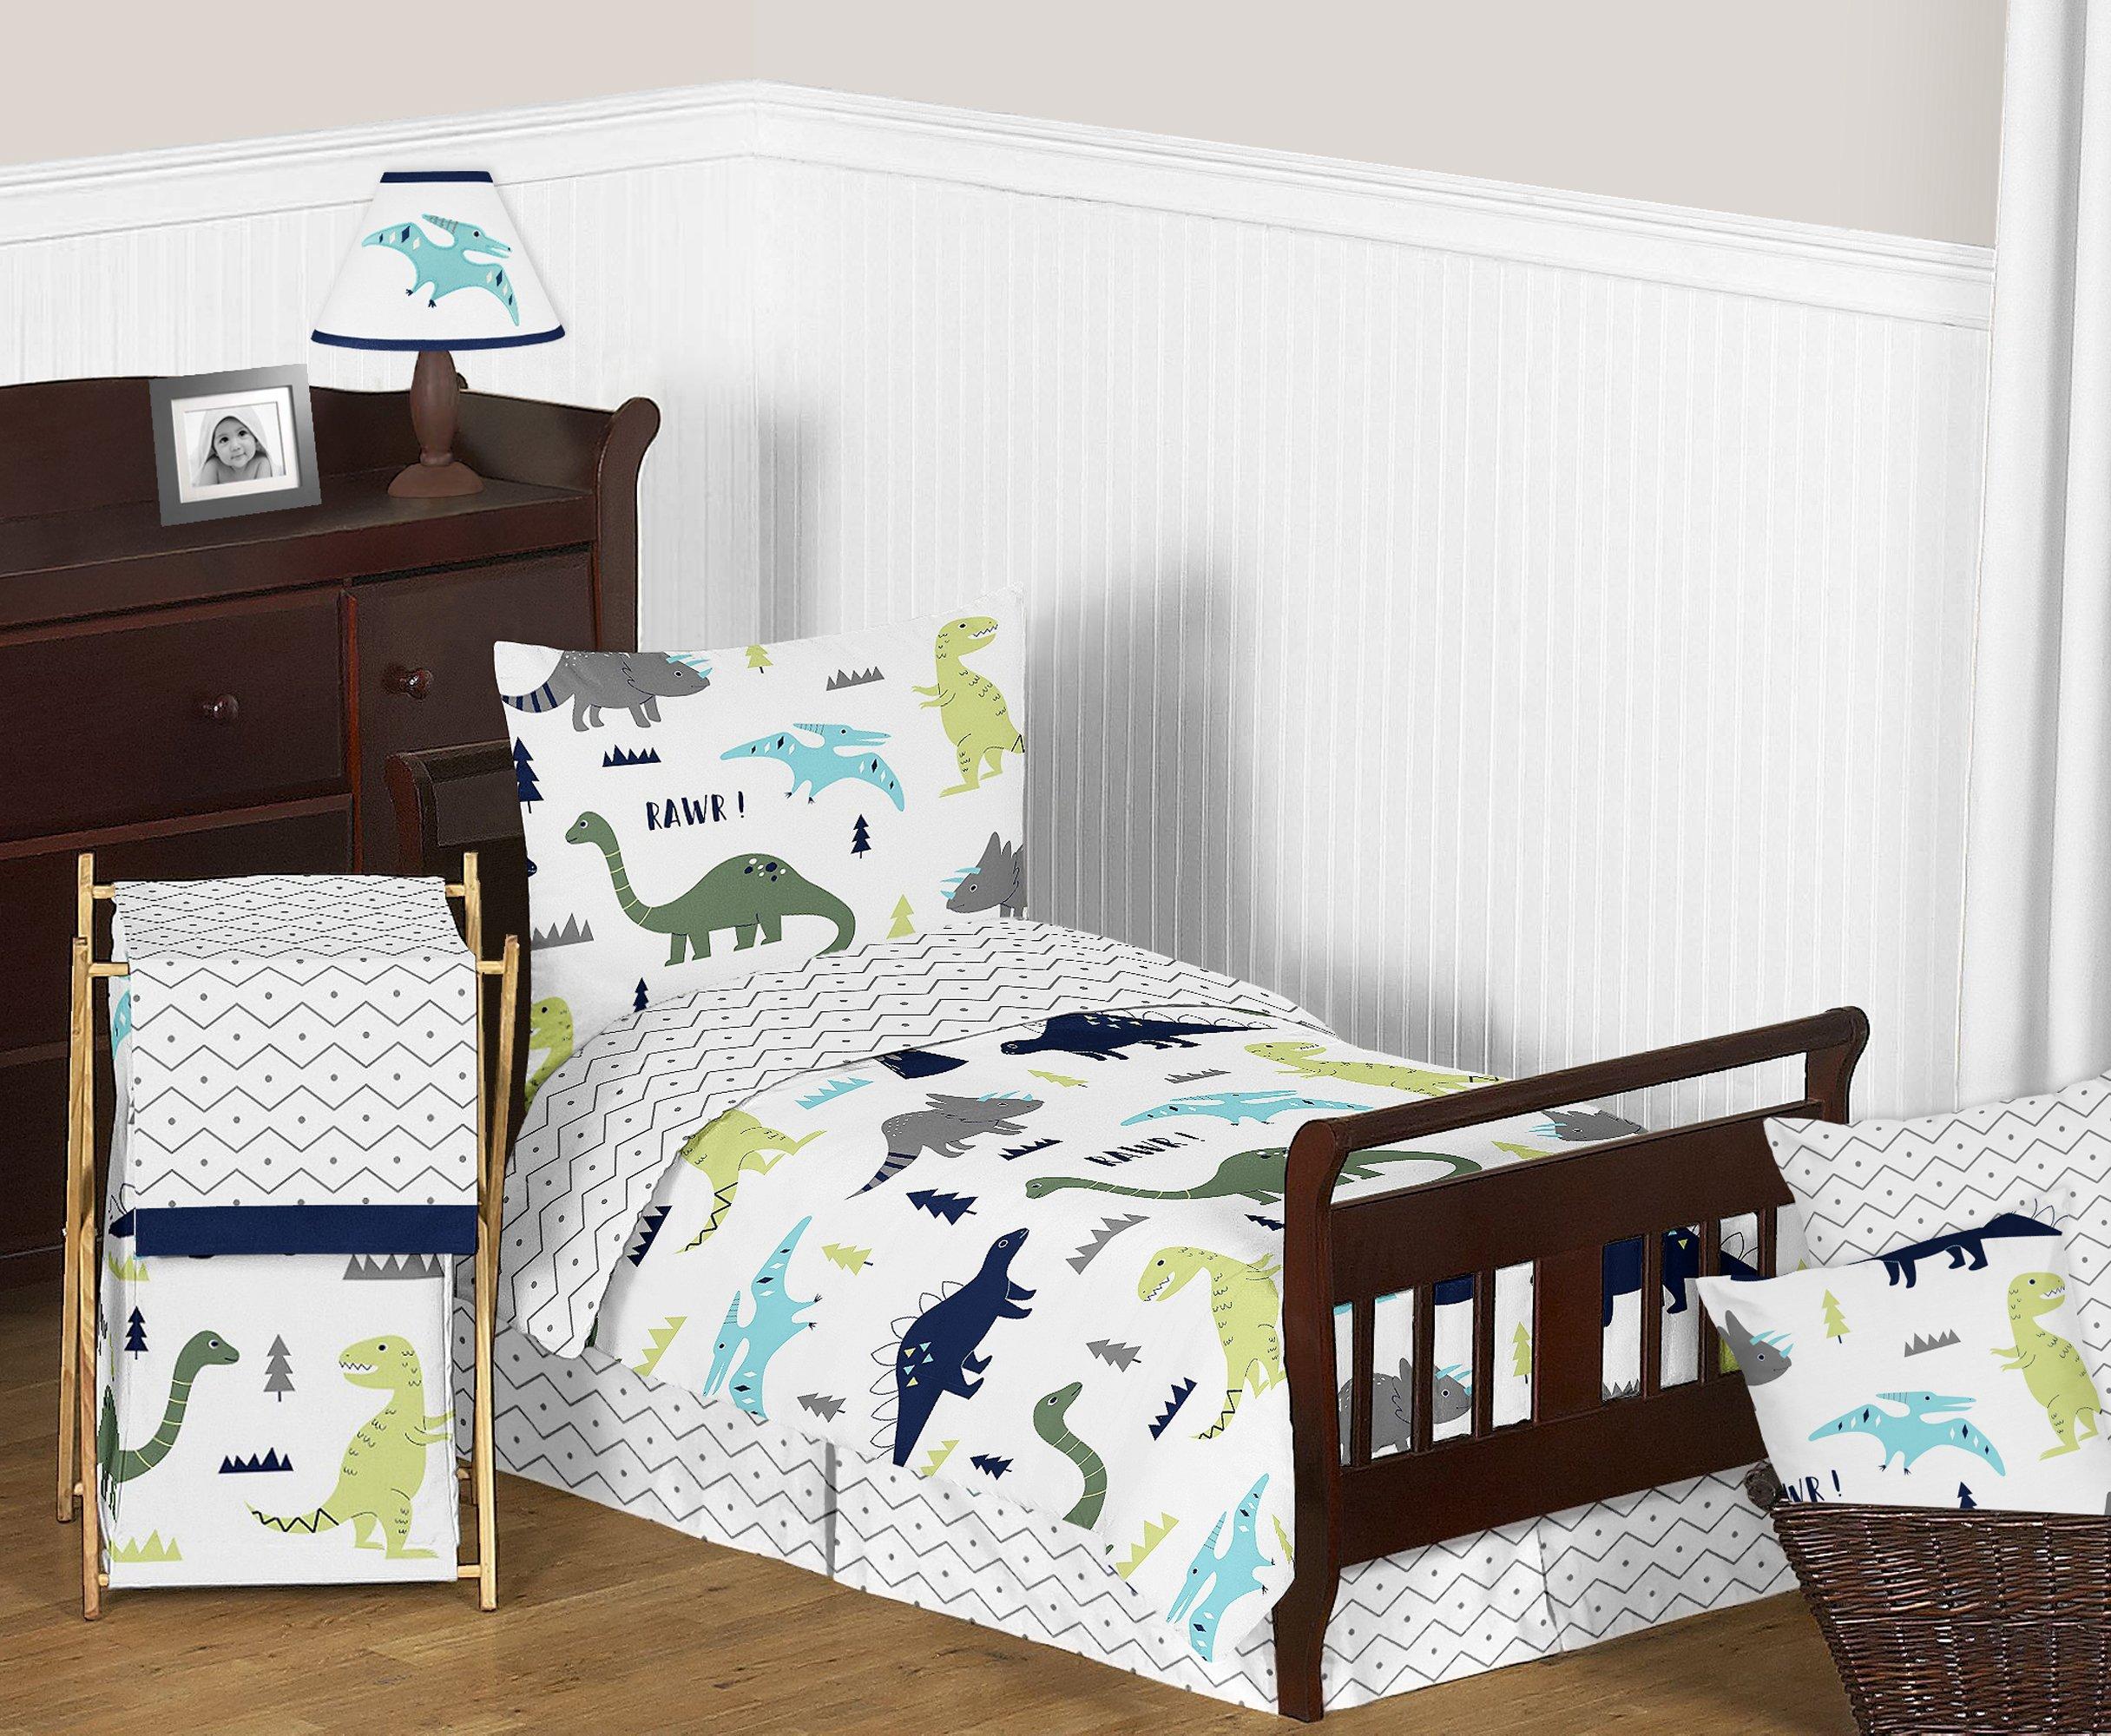 Sweet Jojo Designs 5-Piece Navy Blue and Green Modern Dinosaur Boys or Girls Toddler Bedding Comforter Sheet Set by Sweet Jojo Designs